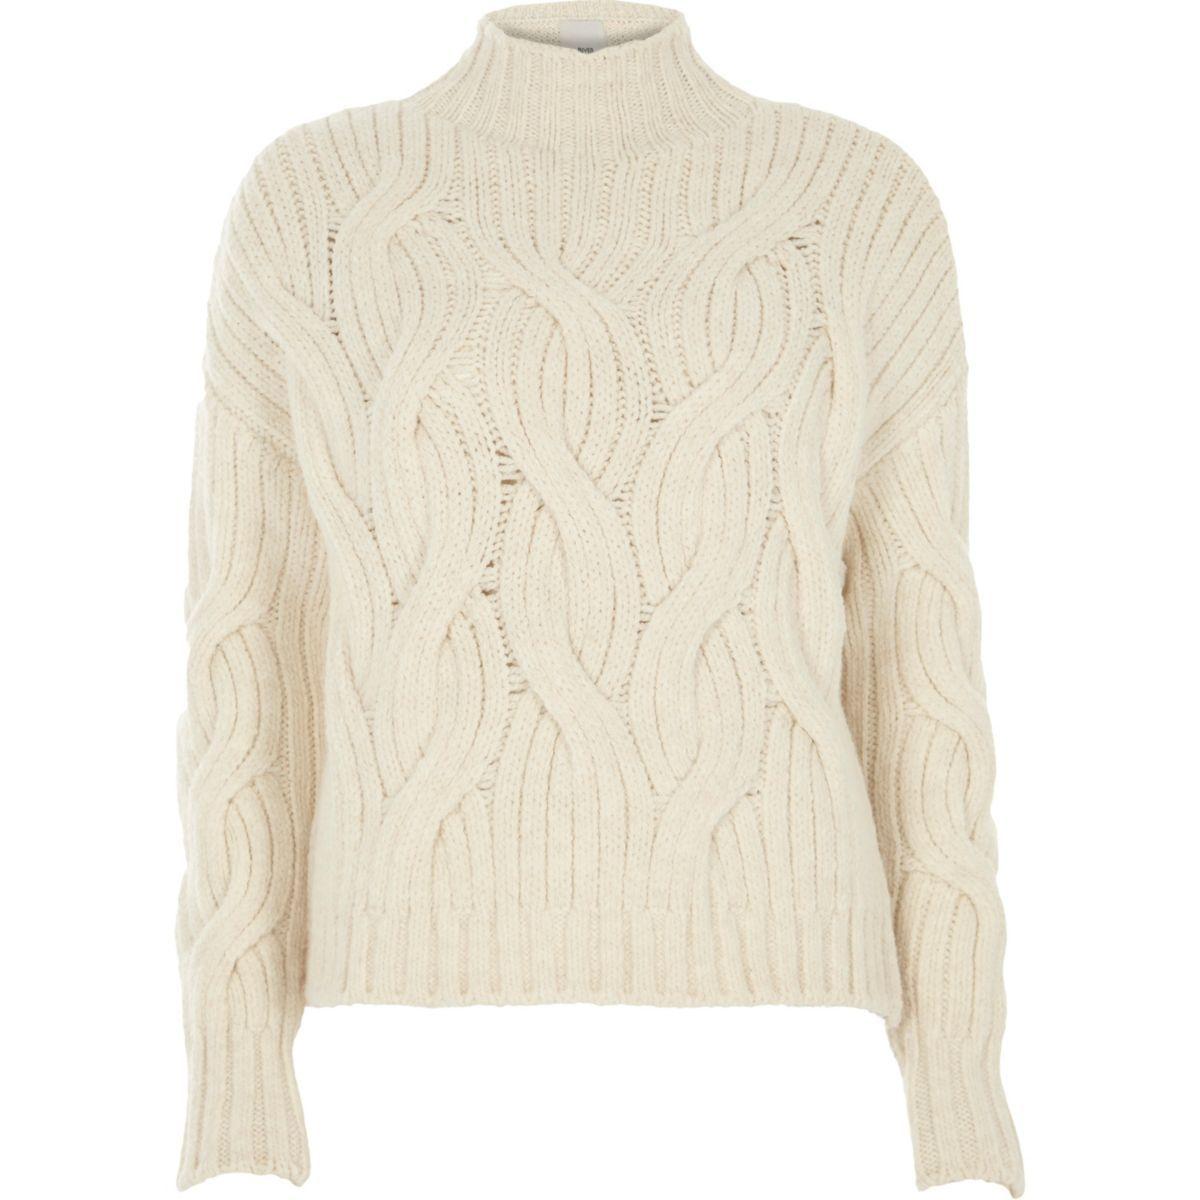 New Women Bobble Knit Sleeve Cardigan Ladies Winter High Street Sweaters Jumper